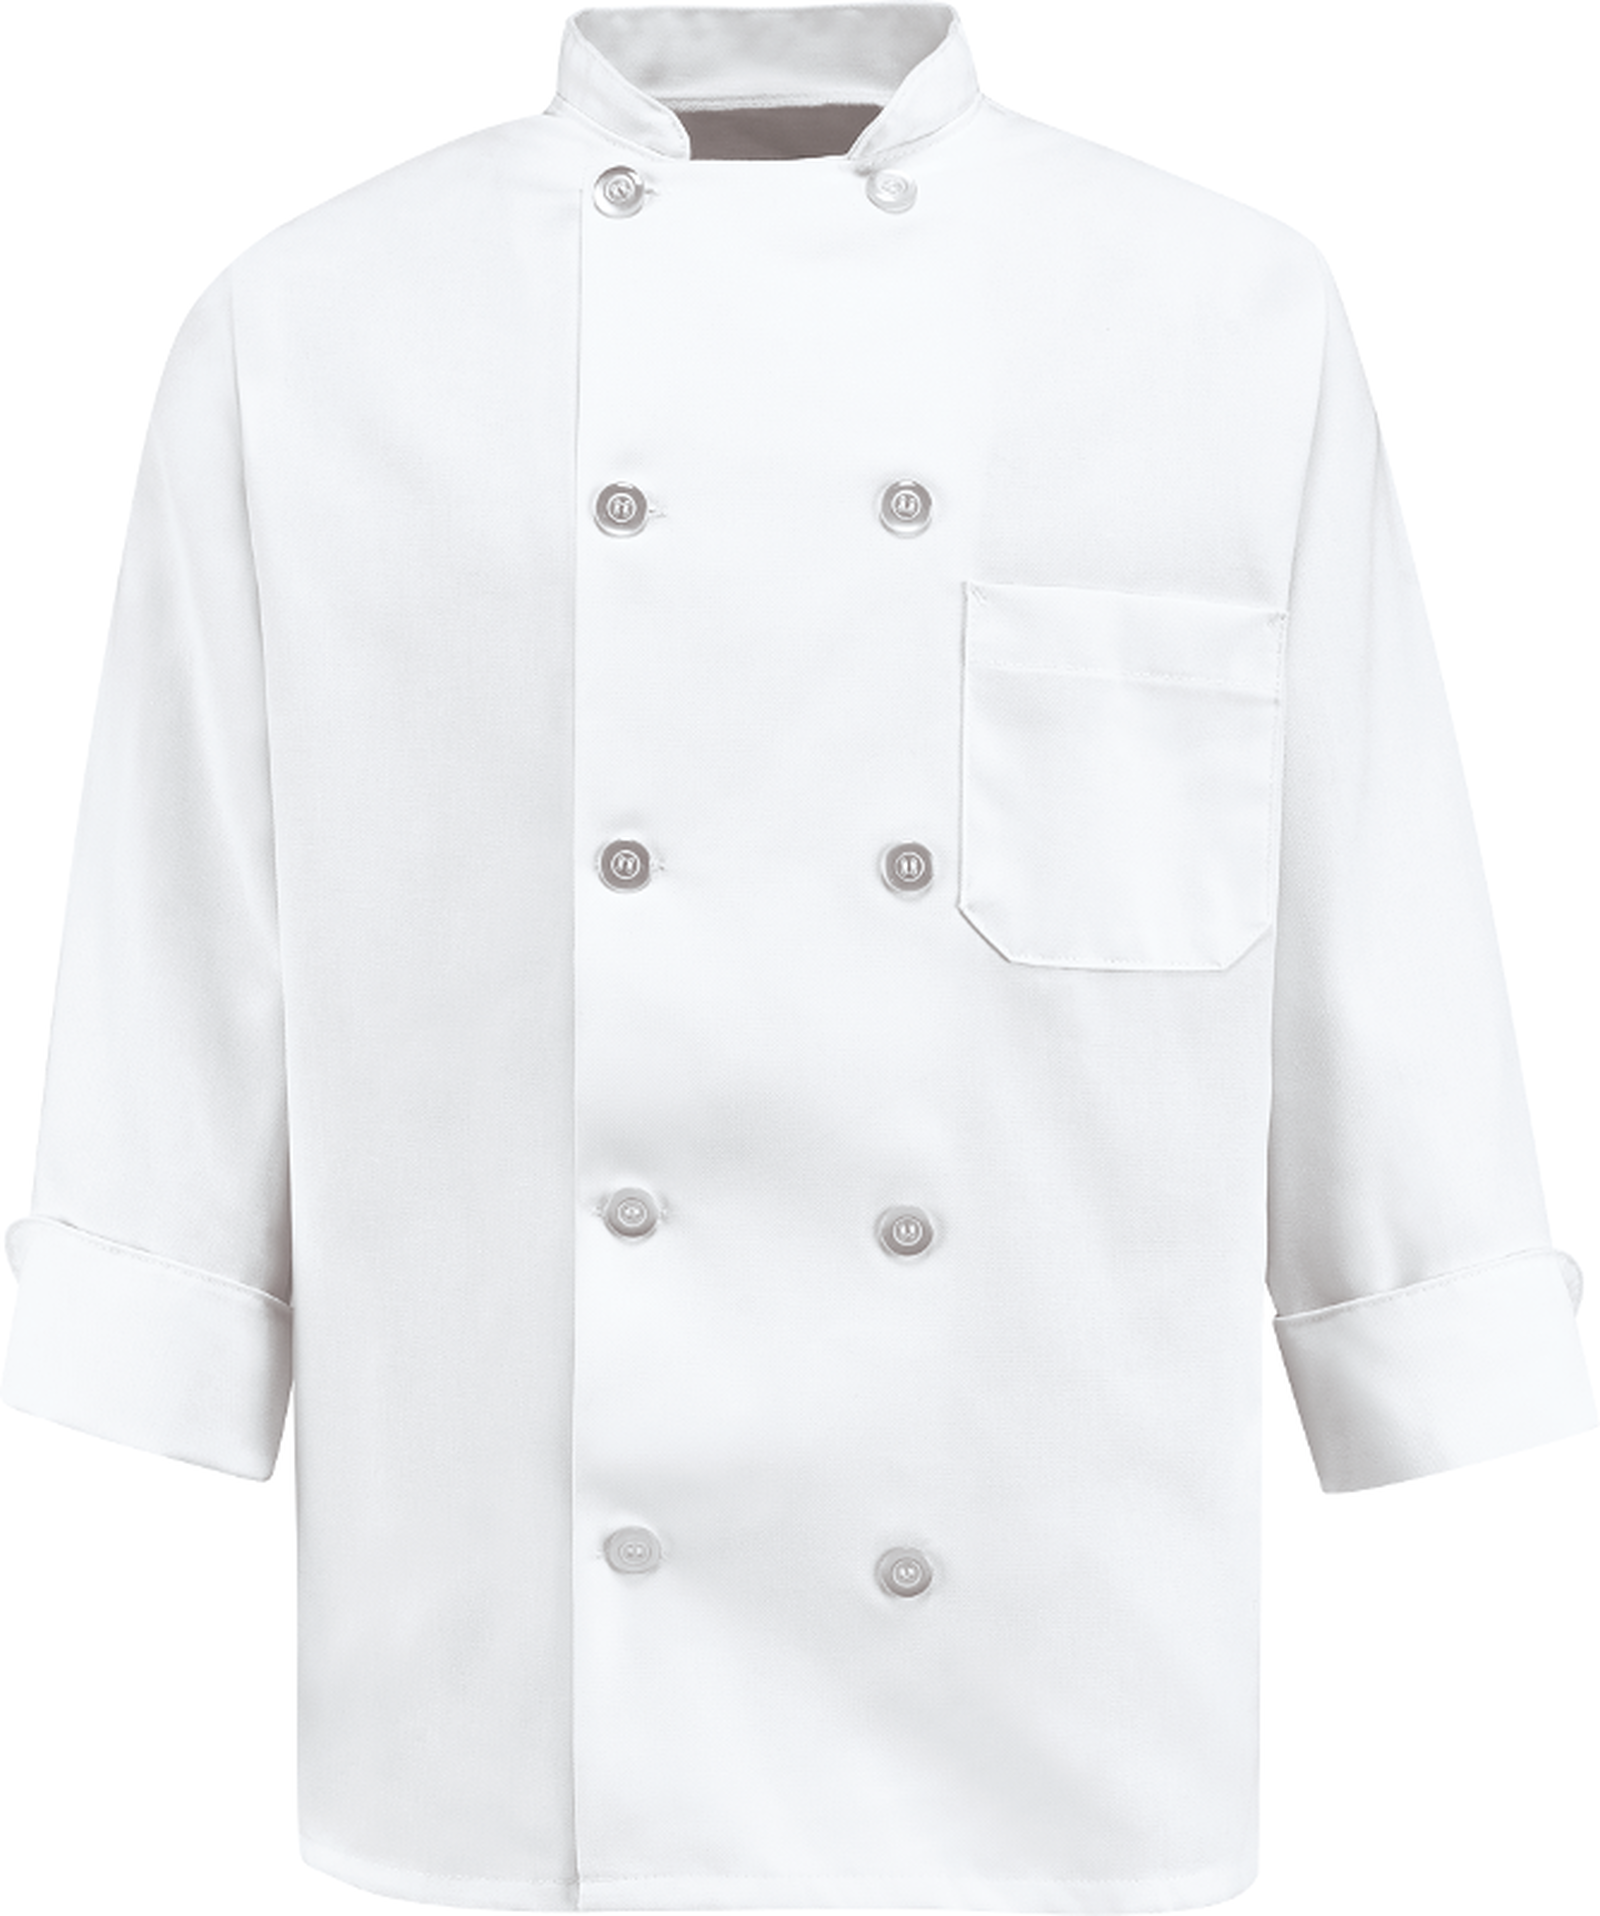 Chef Designs Women's Chef Coat